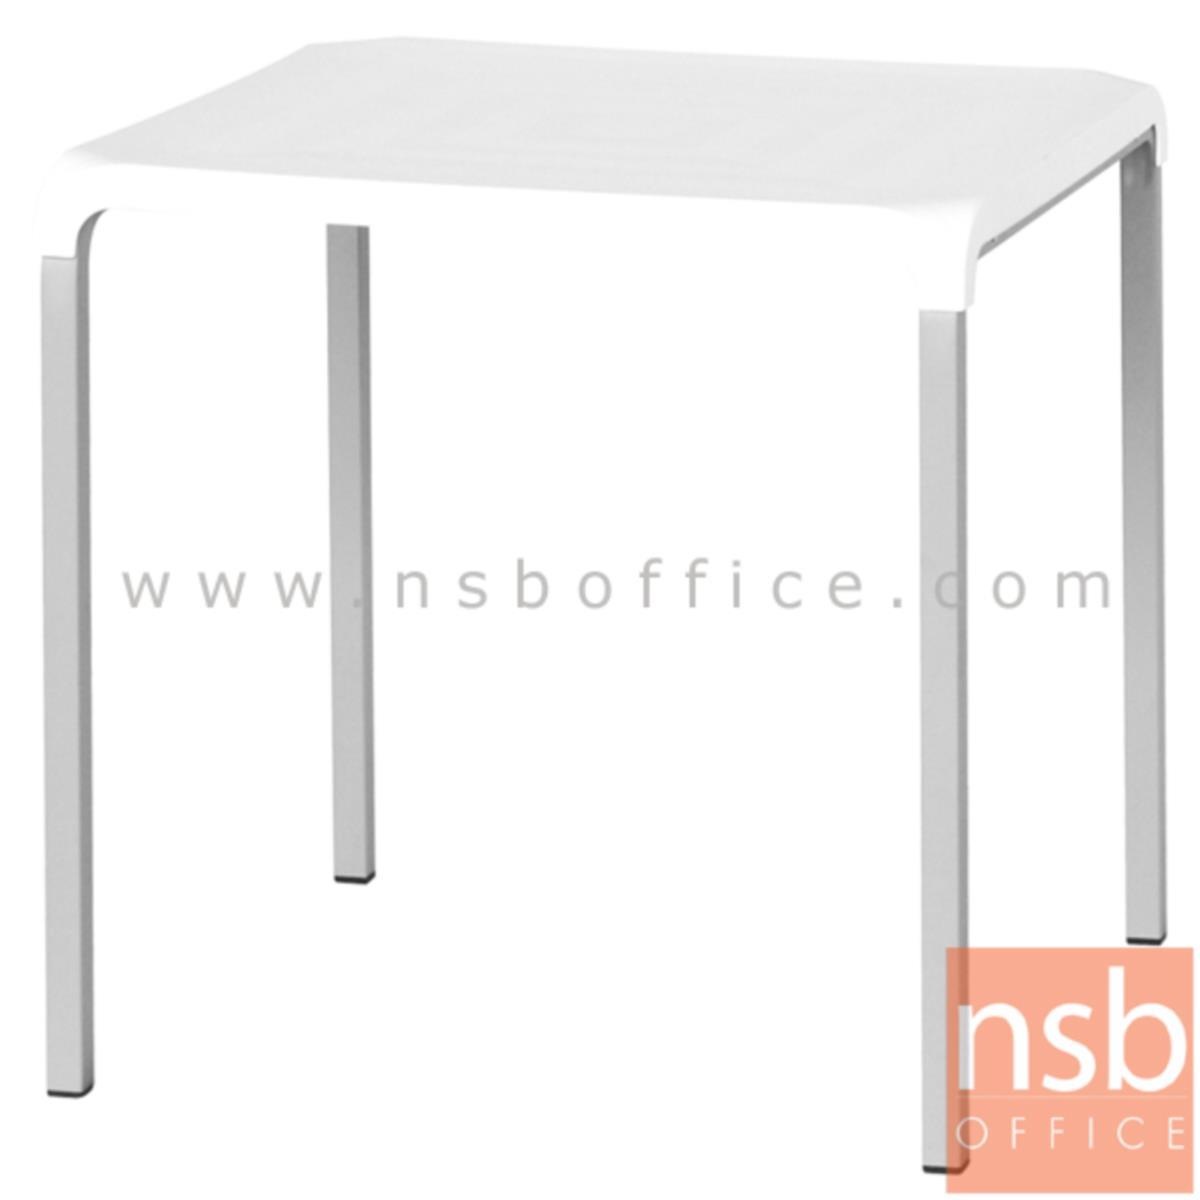 A14A047:โต๊ะหน้าพลาสติก(ABS) รุ่น PP9448  ขนาด 72W cm.  ขาเหล็กพ่นเทา(PP)